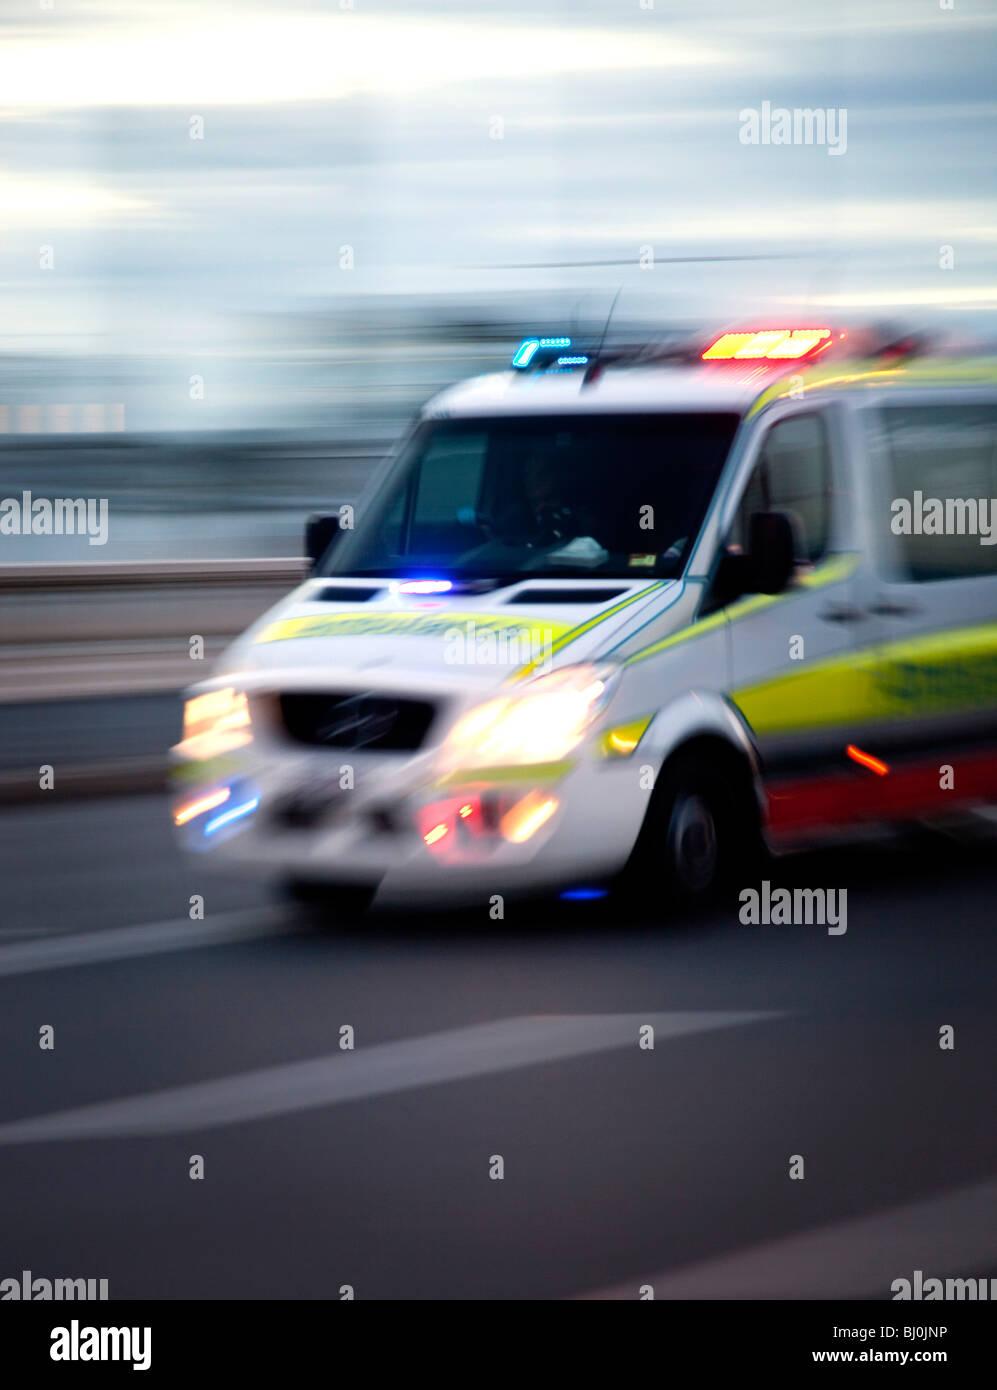 Ambulance motoring along street with lights flashing - Stock Image